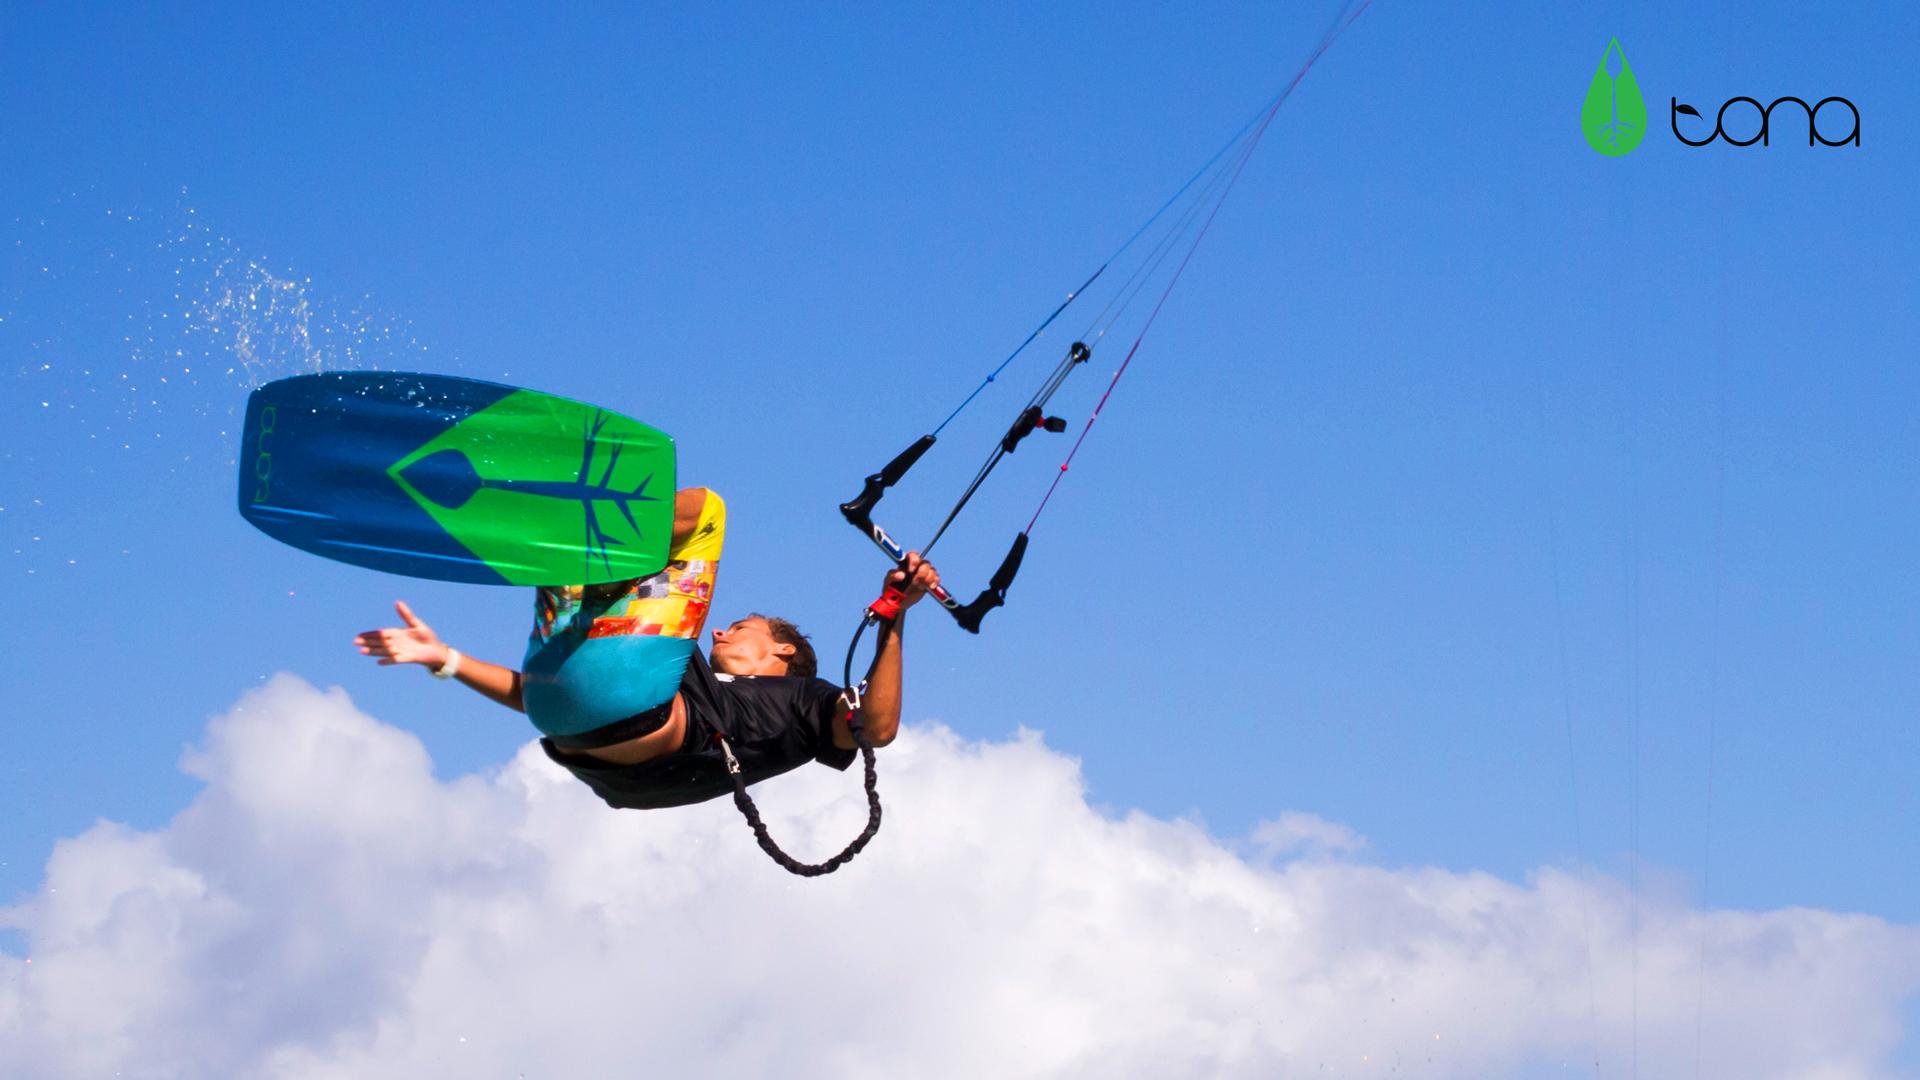 kitesurf wallpaper image - Jake Kelsick on the Tona Pop board handlepassing awefully close a C4 Ozone kite - in resolution: High Definition - HD 16:9 1920 X 1080